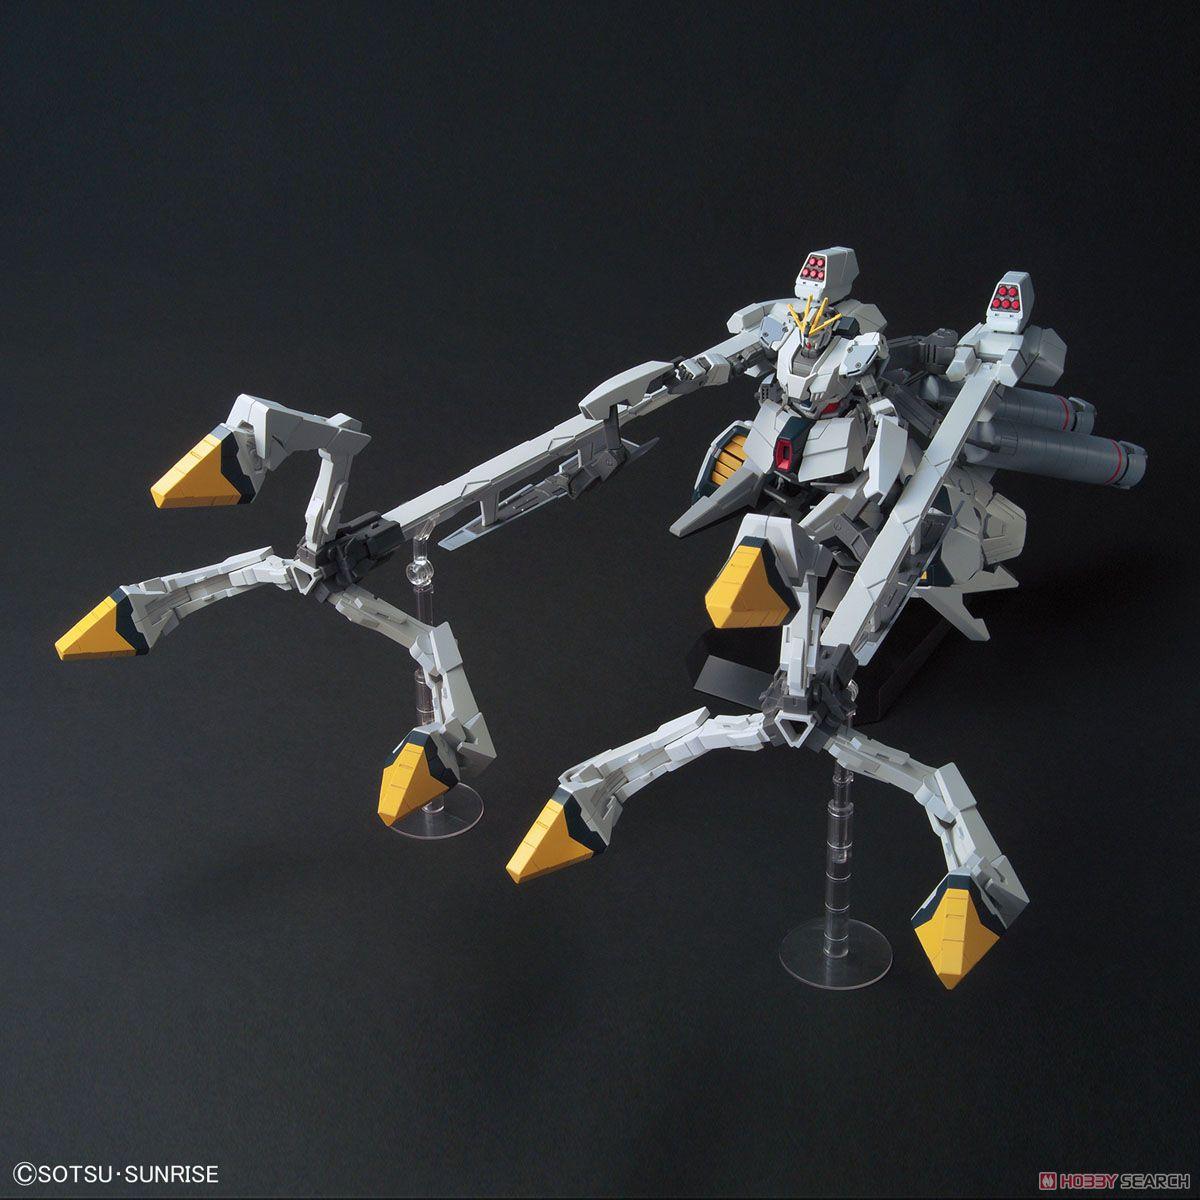 HGUC『ナラティブガンダム A装備』ガンダムNT 1/144 プラモデル-006